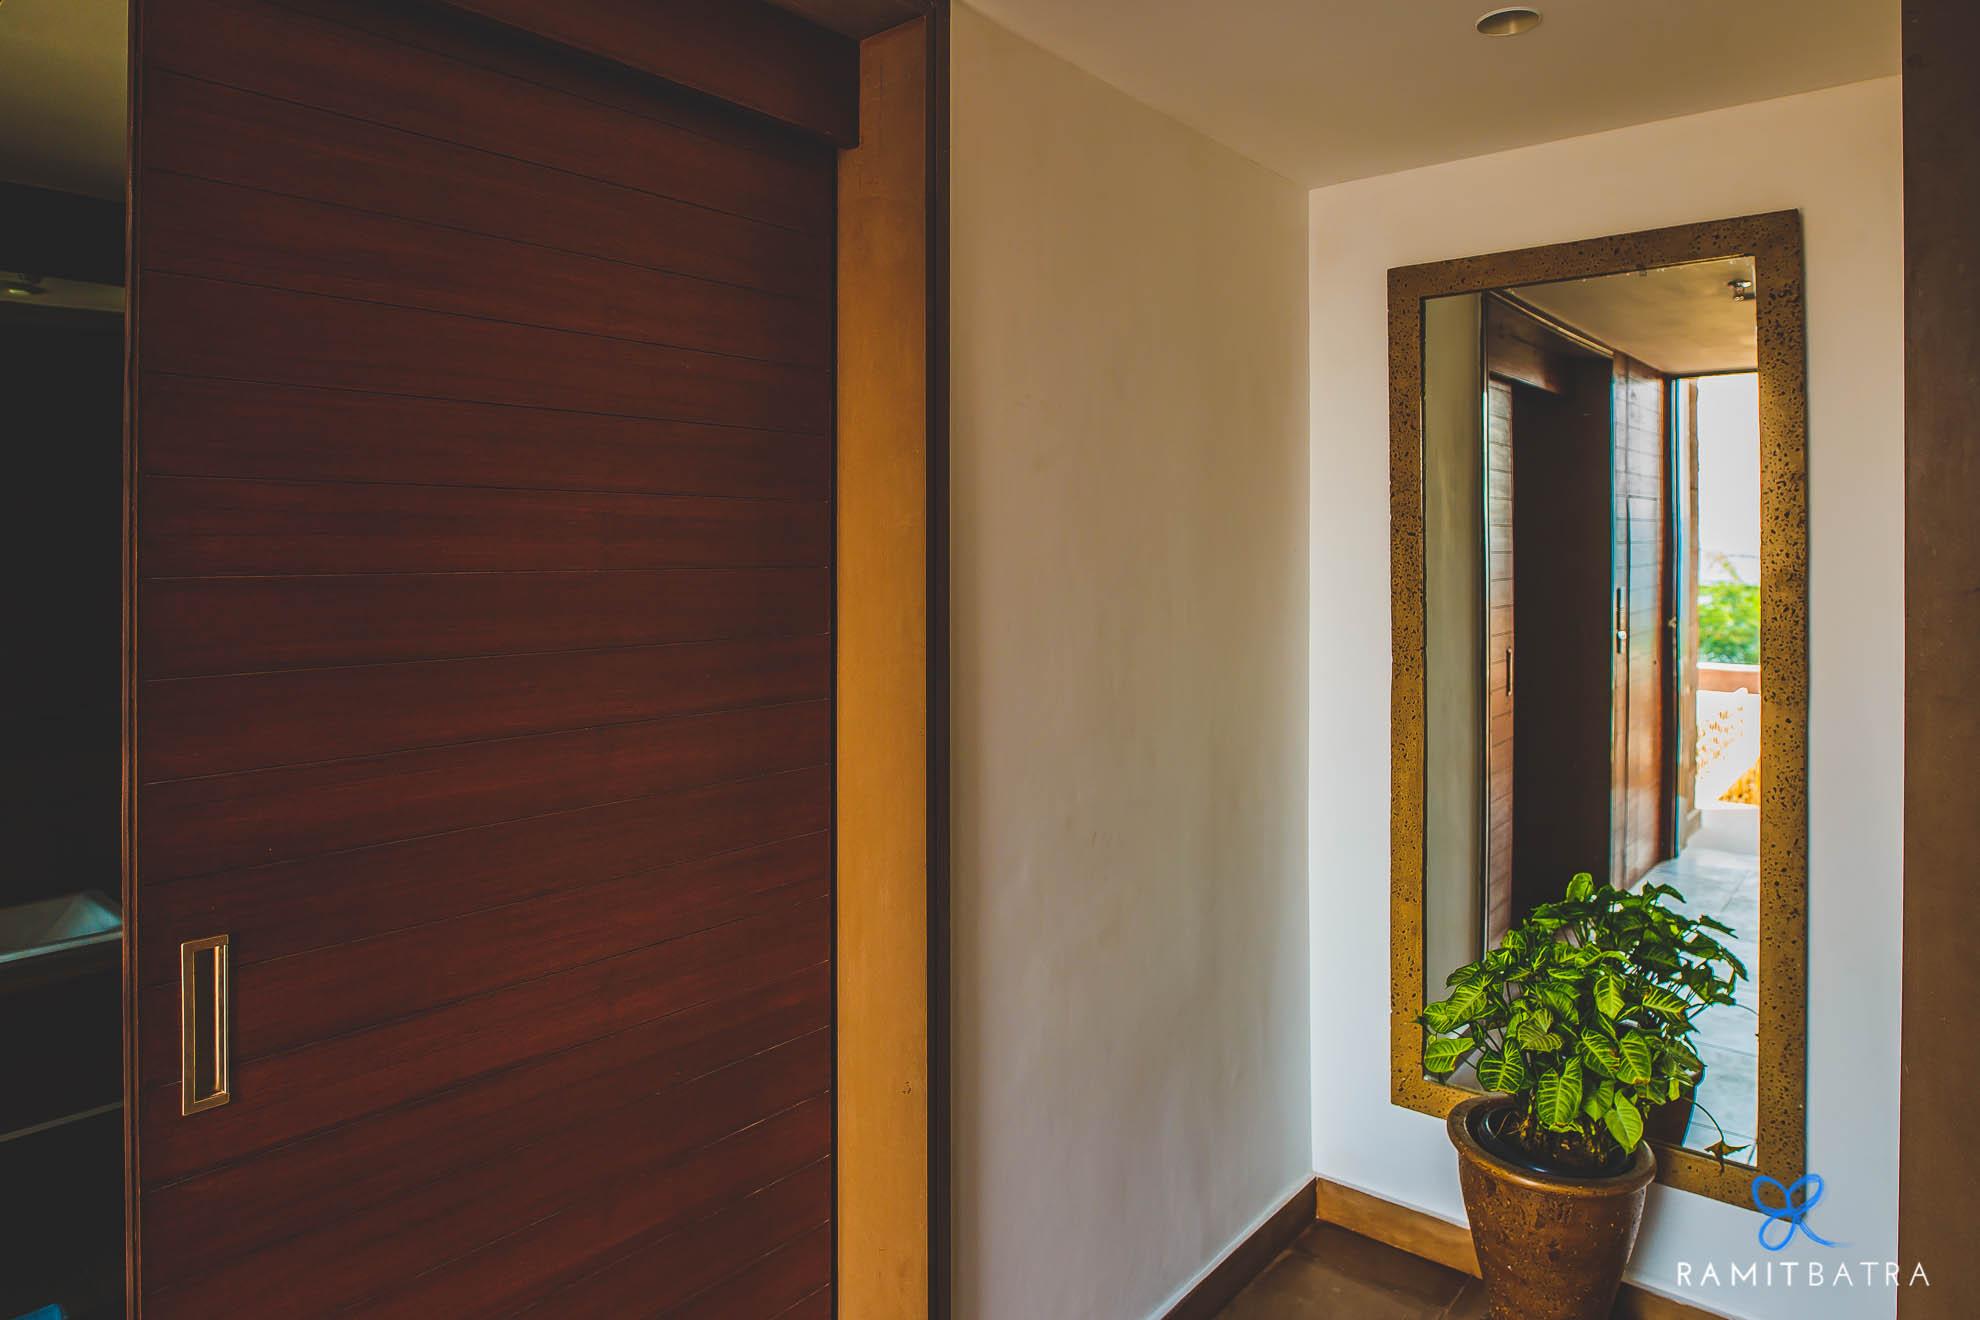 lalit-mangar-hotel-near-delhi-ramitbatra-007